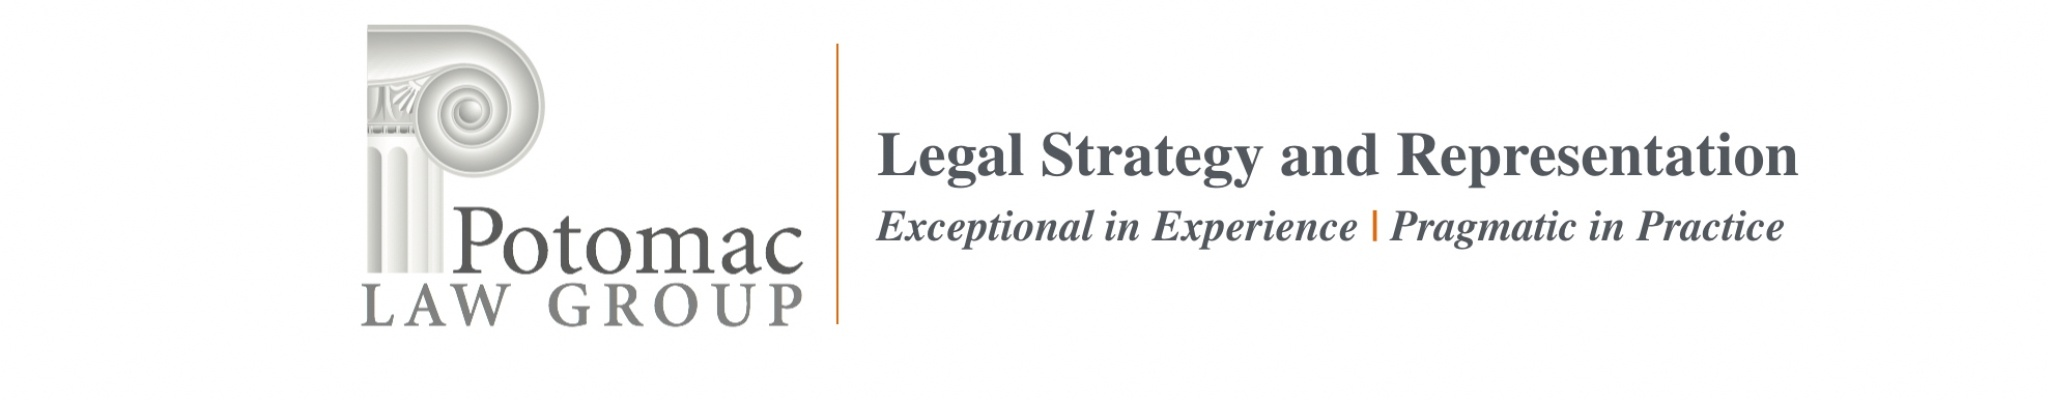 Potomac Law, Heather Broadwater